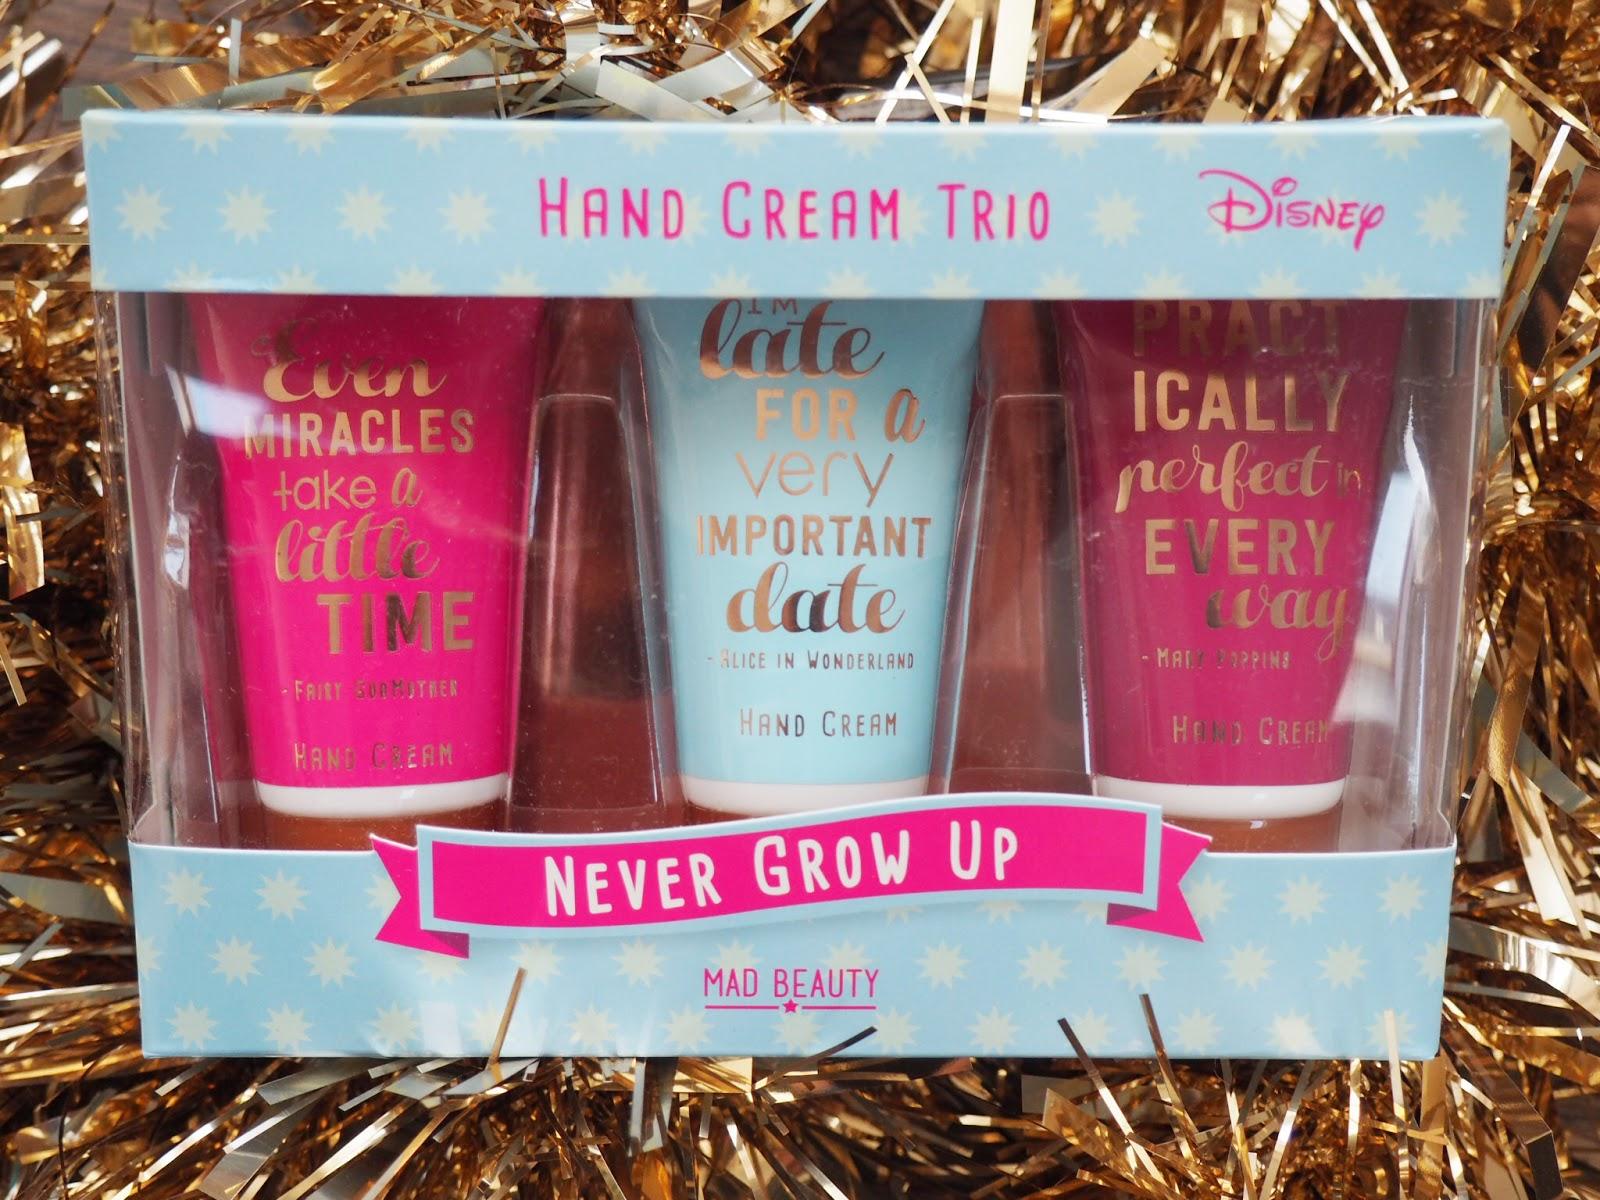 Mad Beauty - Never Too Old Disney hand cream trio